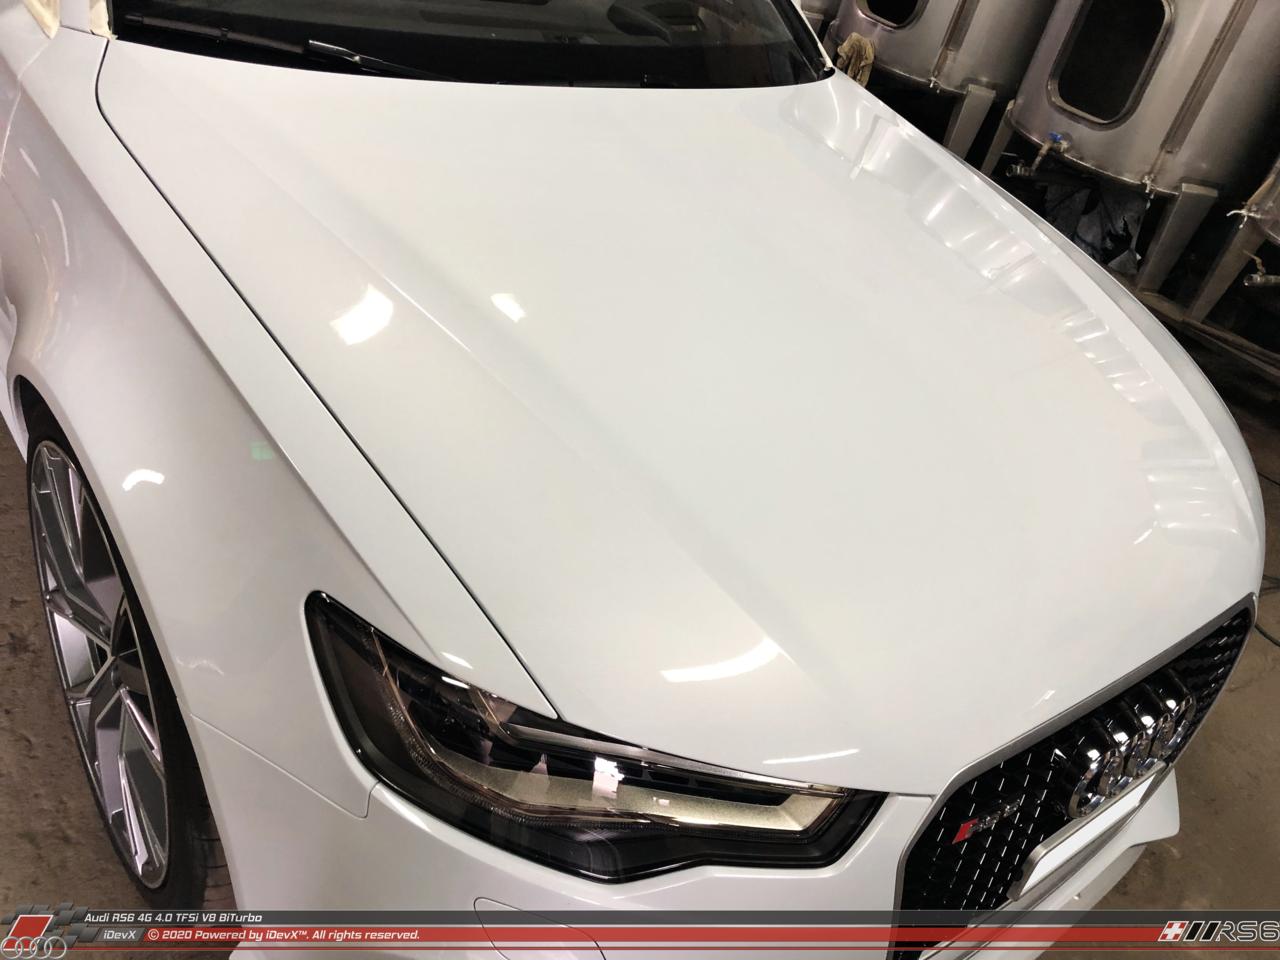 05_08.2019_Audi-RS6_iDevX_015.png